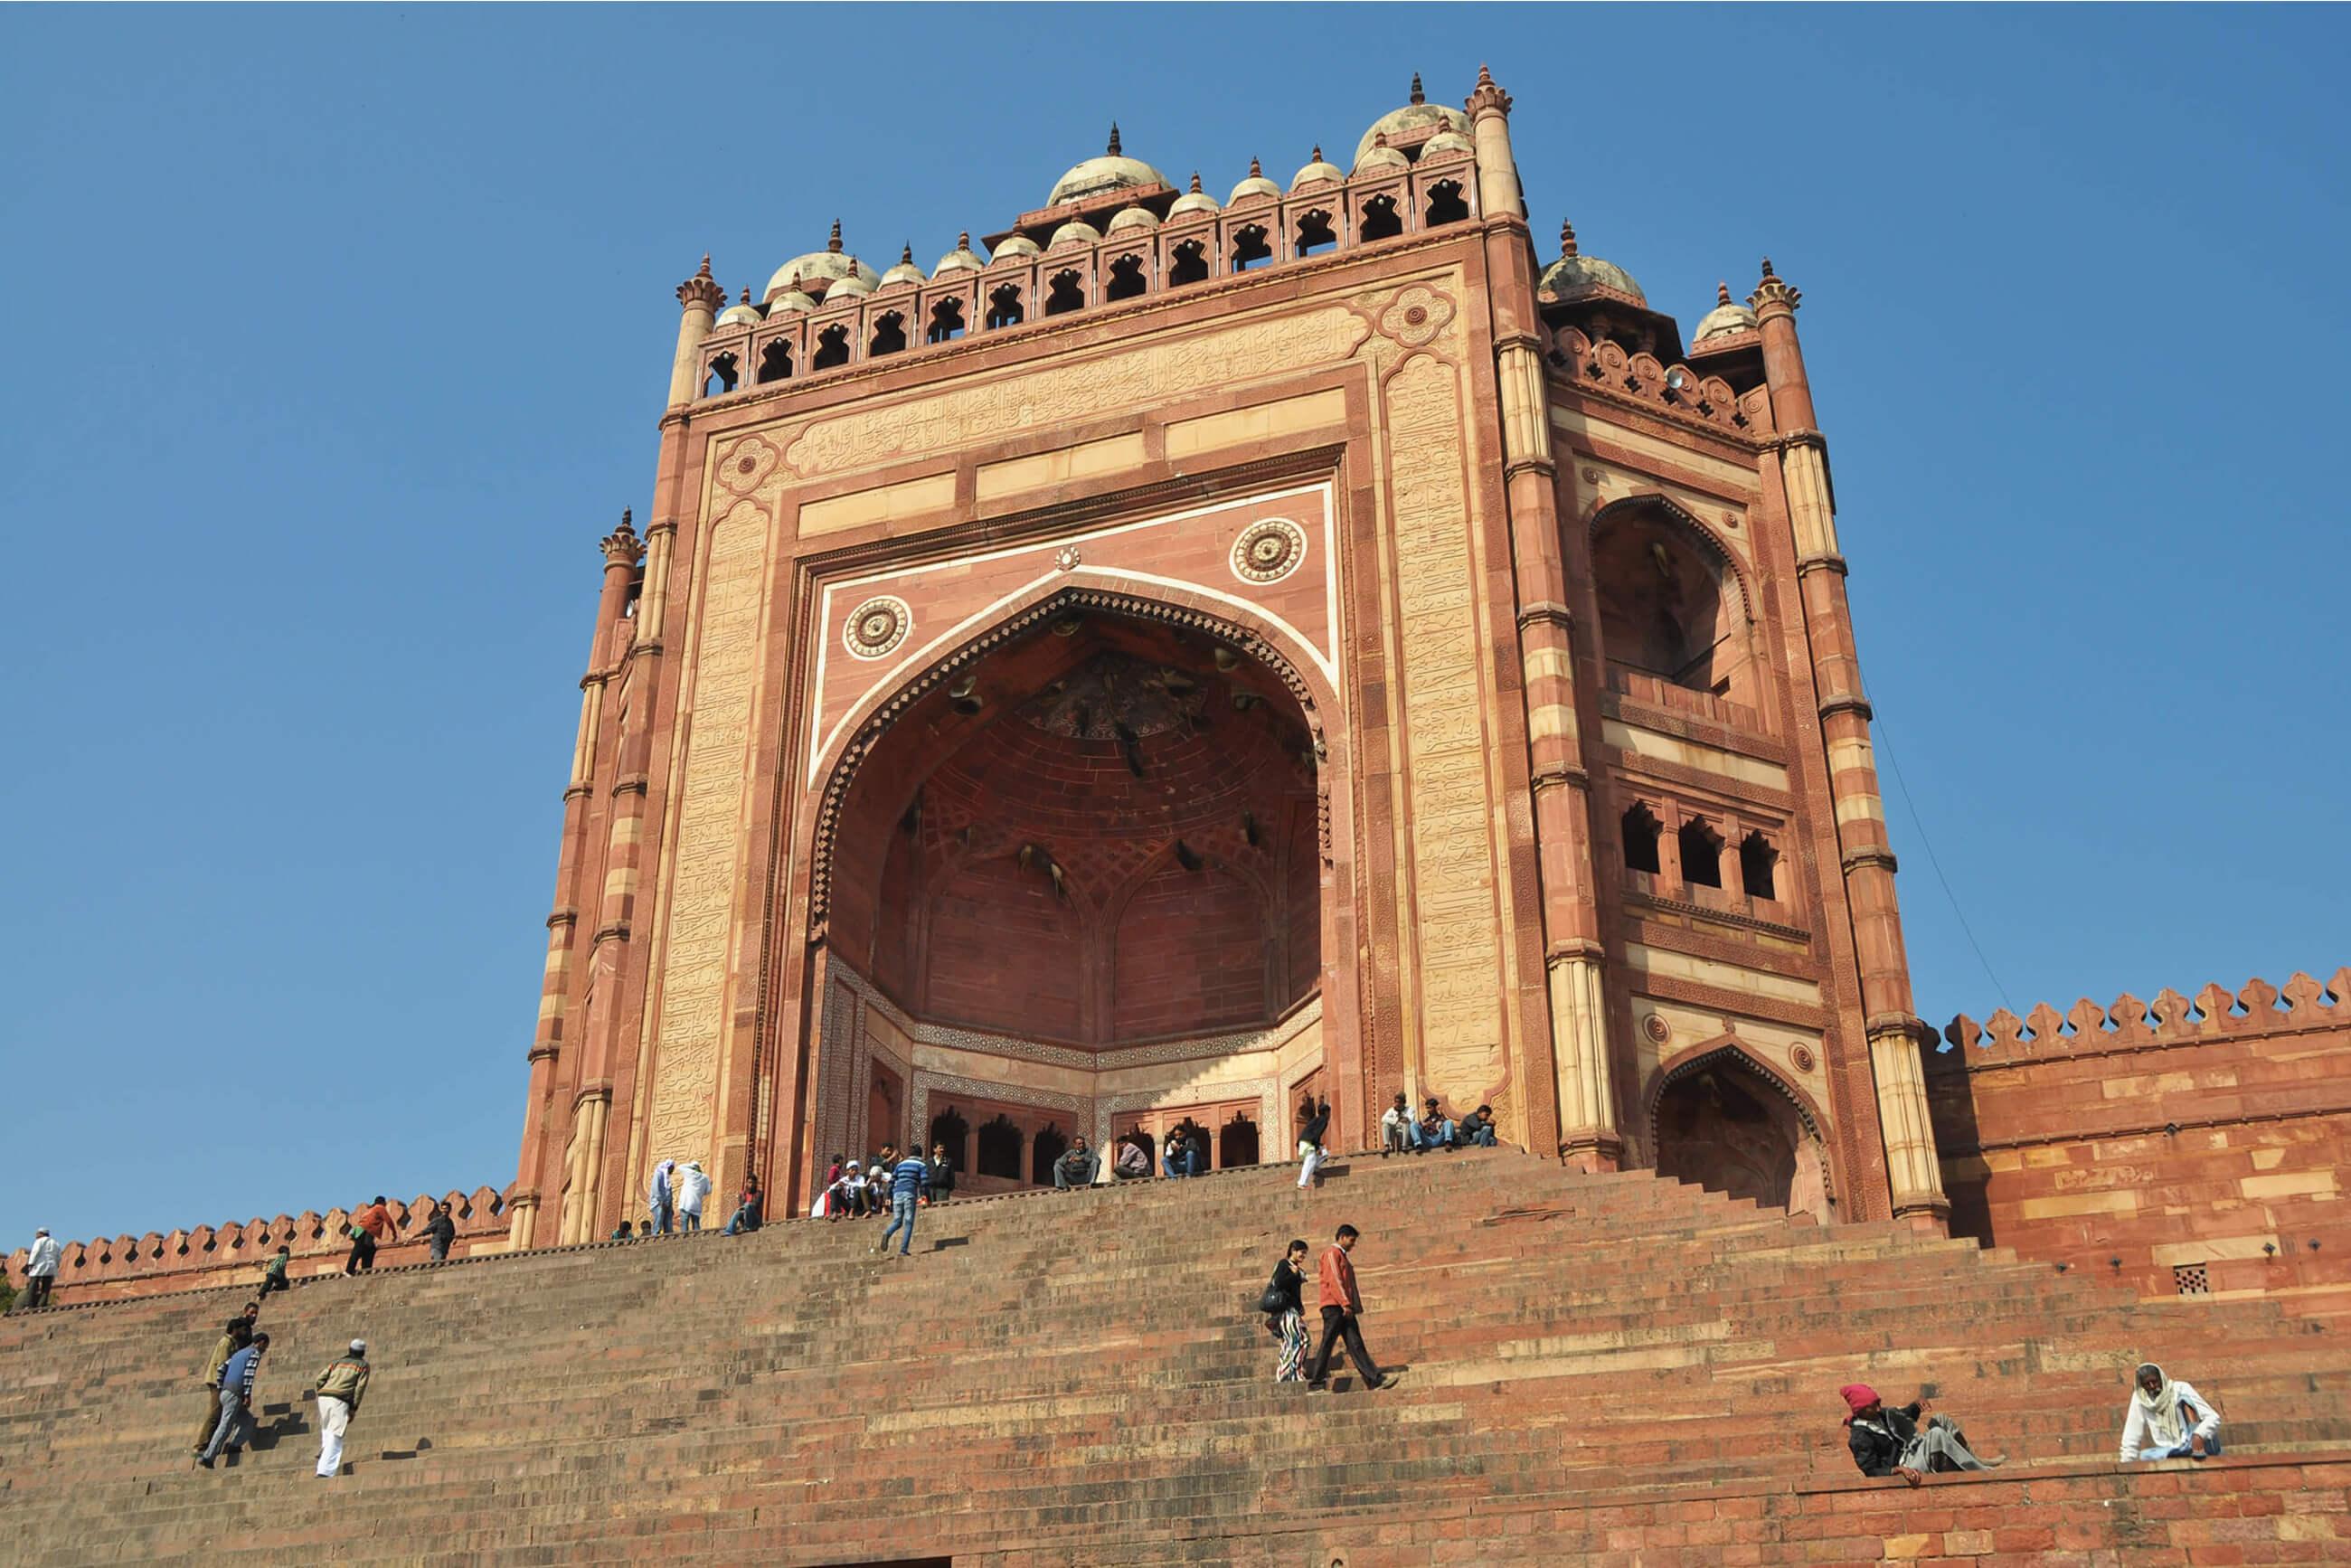 https://bubo.sk/uploads/galleries/16619/tomaskubus_india_fatehpur-sikri-1-.jpg